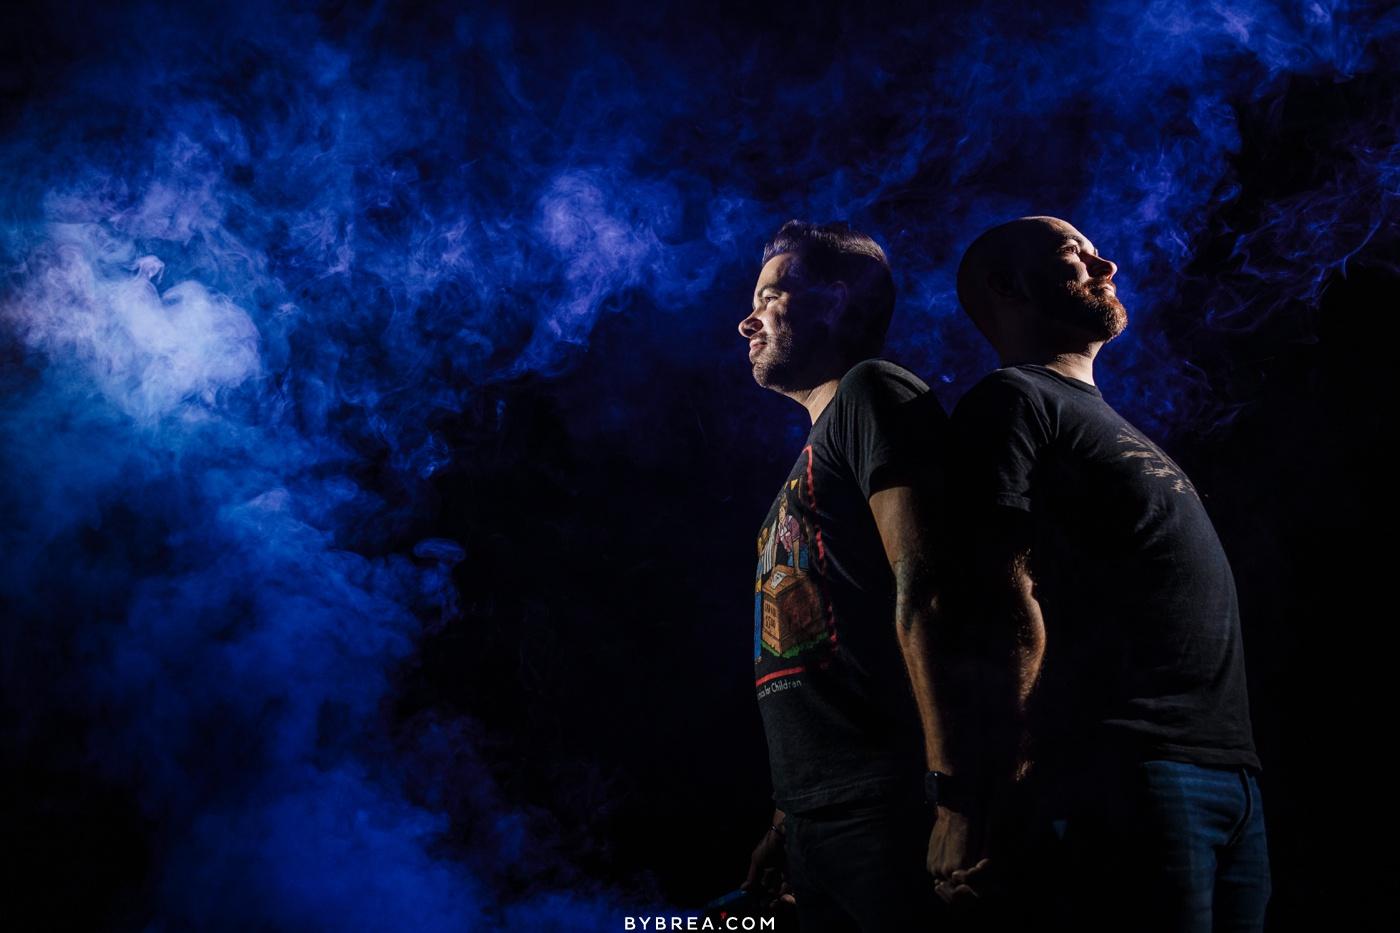 Same-sex portrait with epic lighting and smoke bombs Baltimore